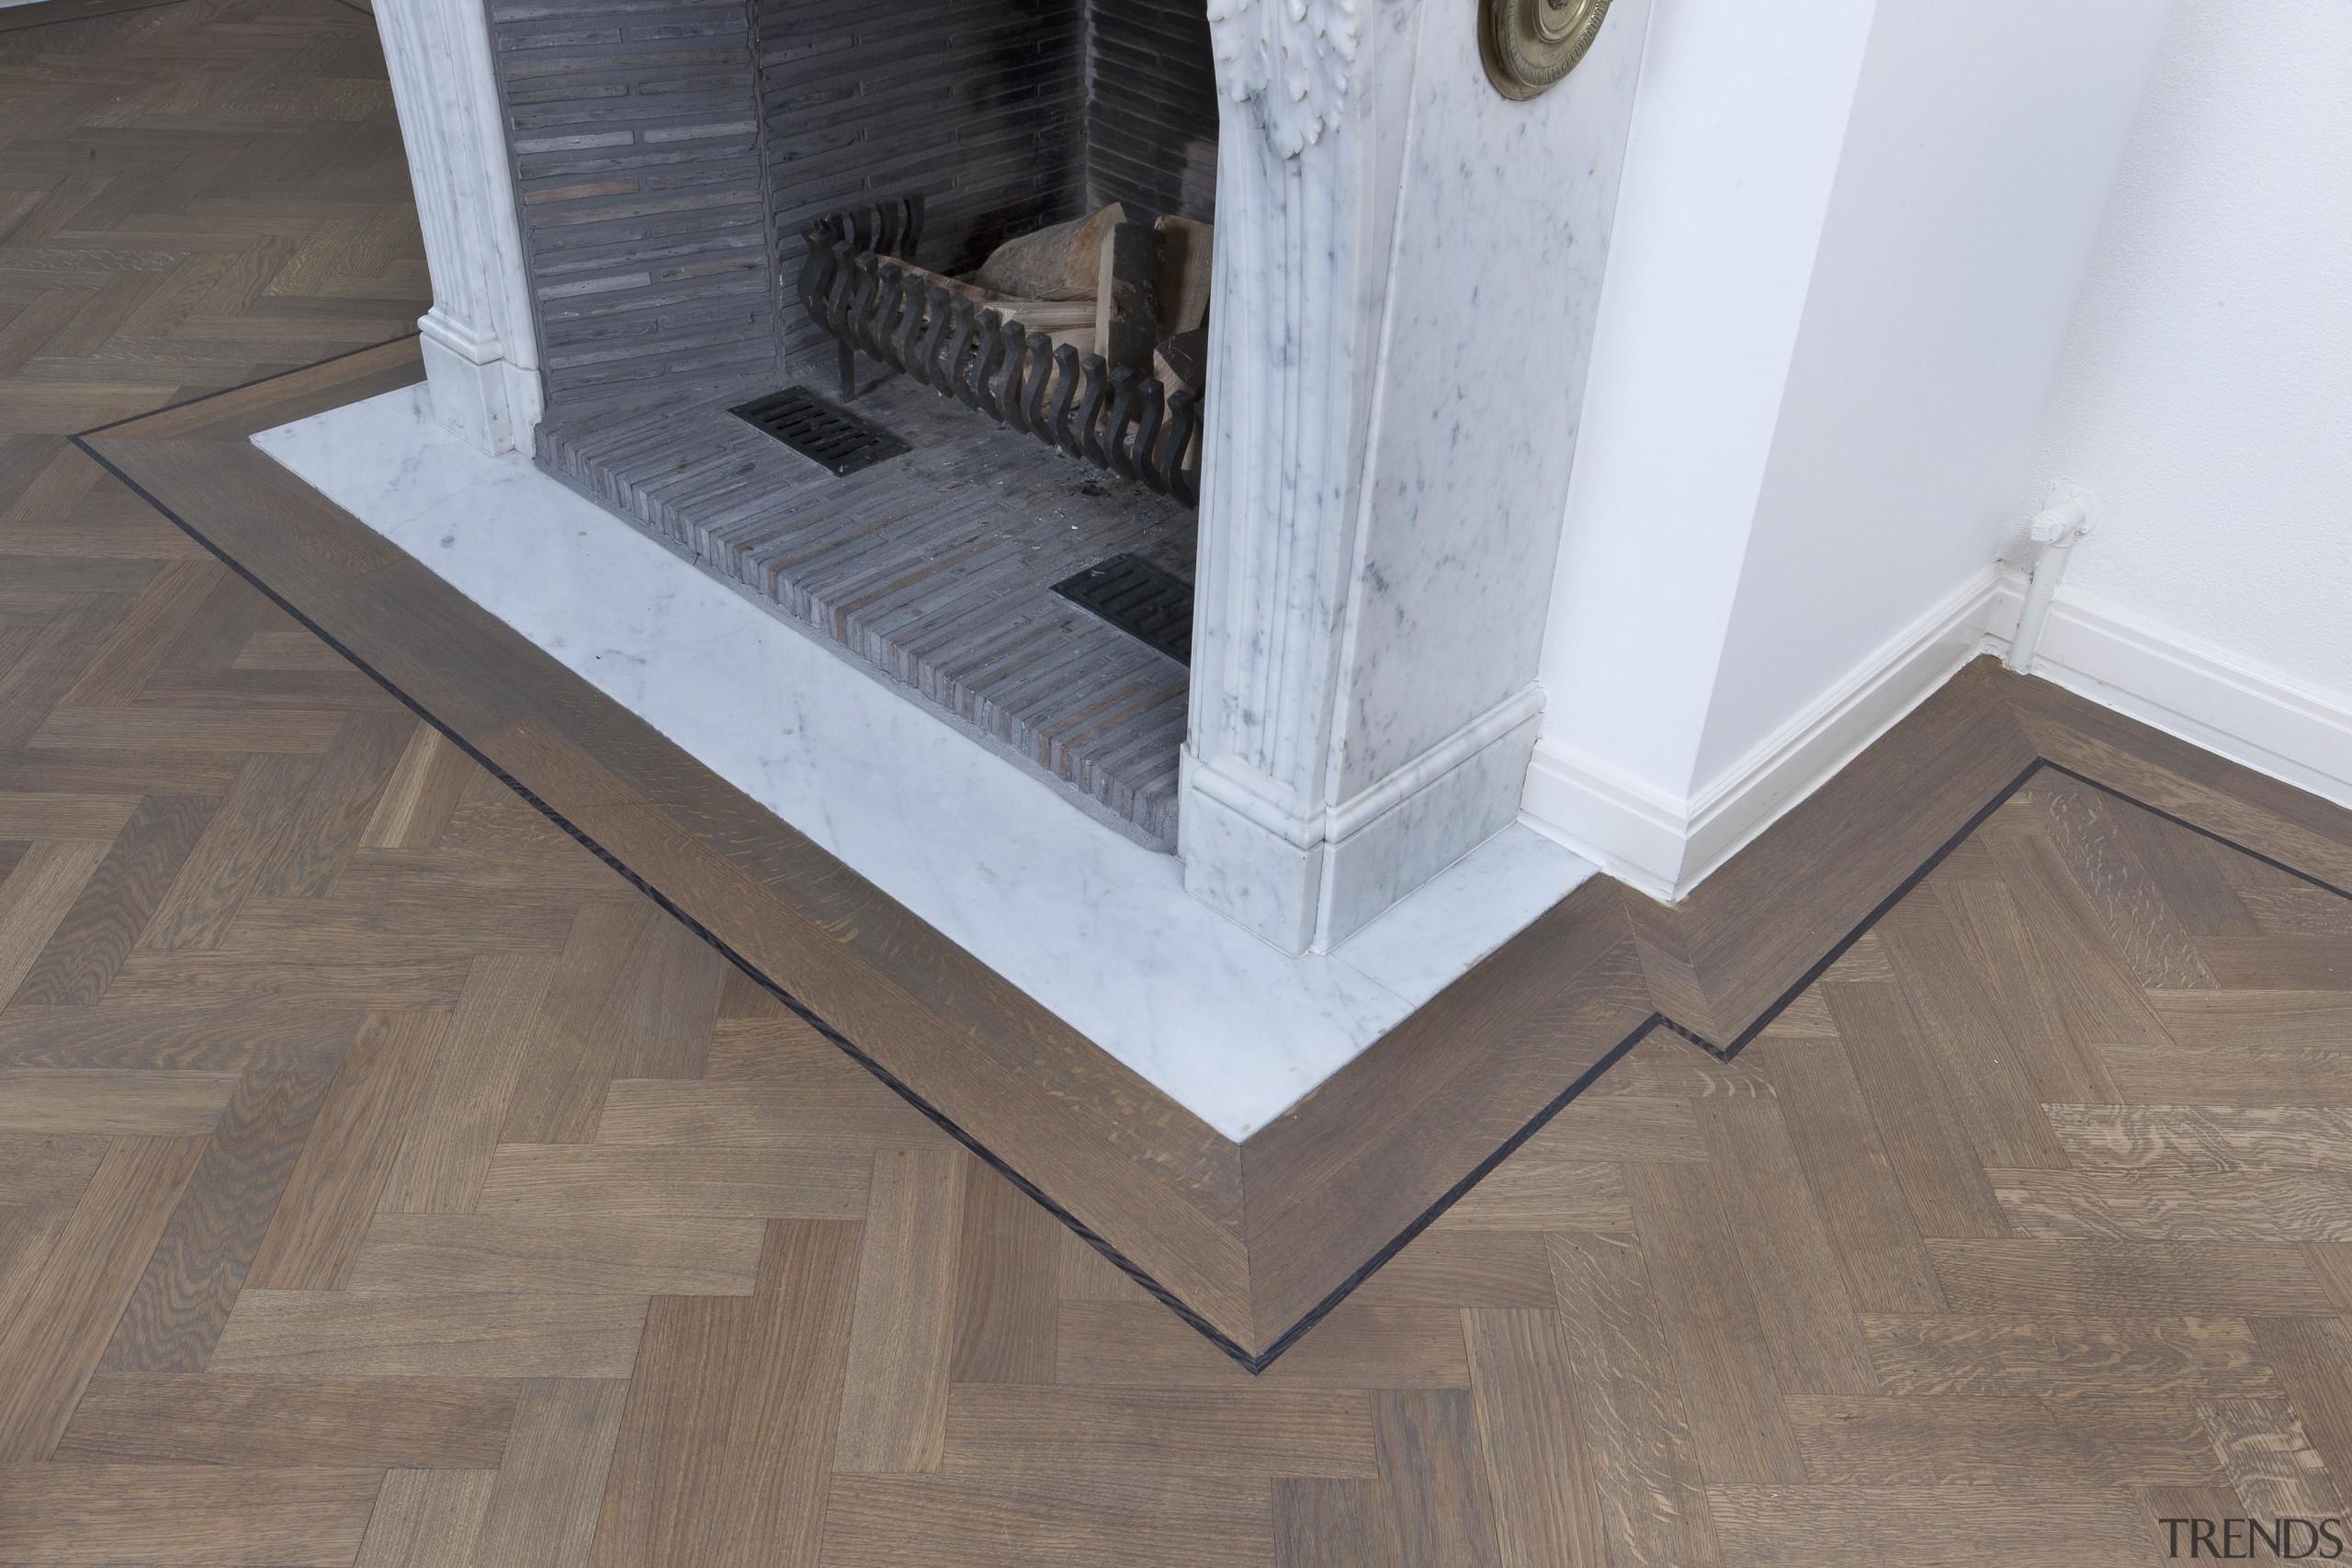 Oak Detailed Floor - floor | flooring | floor, flooring, hardwood, laminate flooring, tile, wood, wood flooring, gray